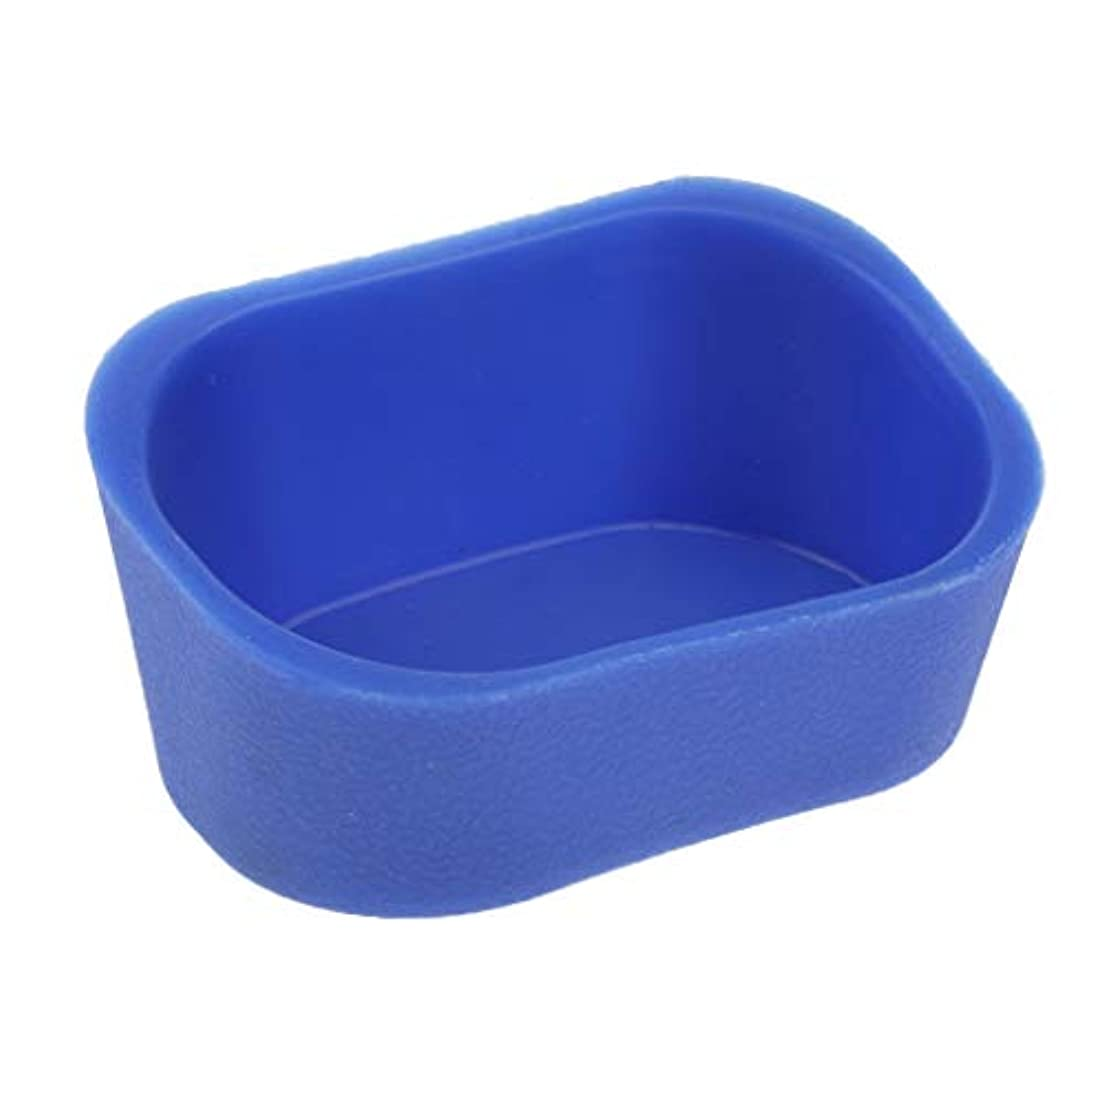 Perfeclan サロンネックピロー シャンプーボウル ネックレス クッション ピロー サロン 5色選べ - 青